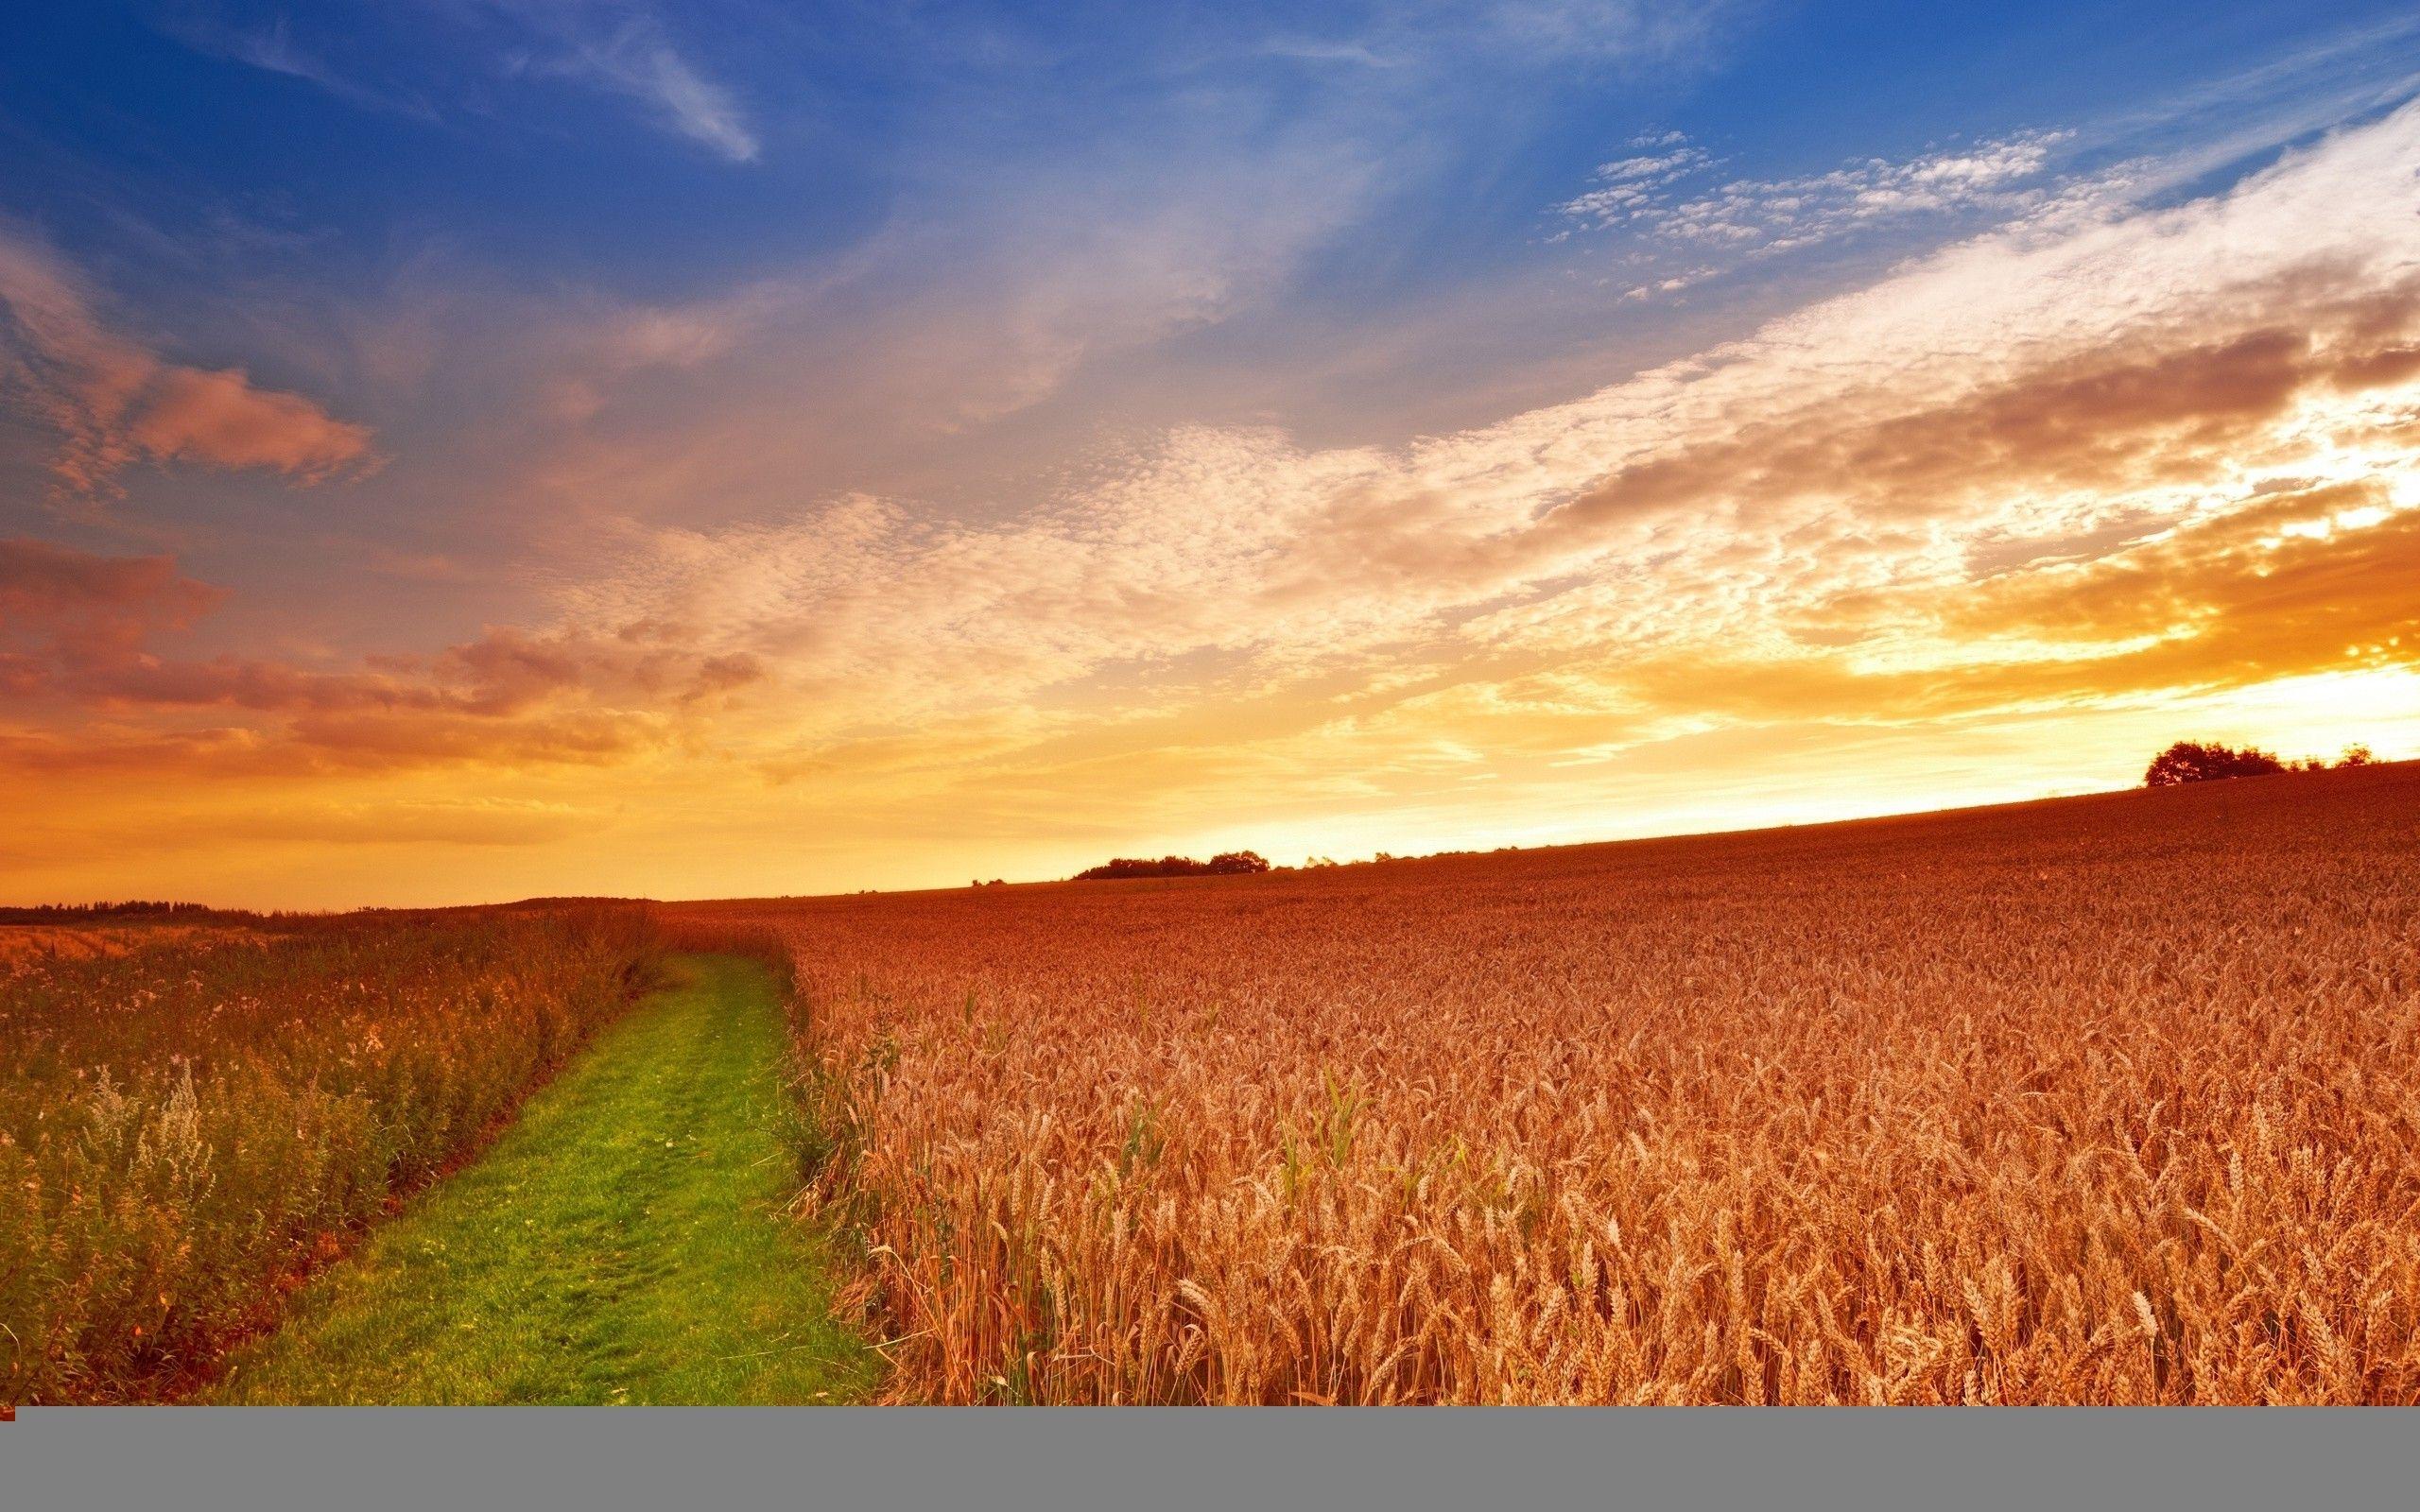 Farm Wallpapers   Top Farm Backgrounds   WallpaperAccess 2560x1600